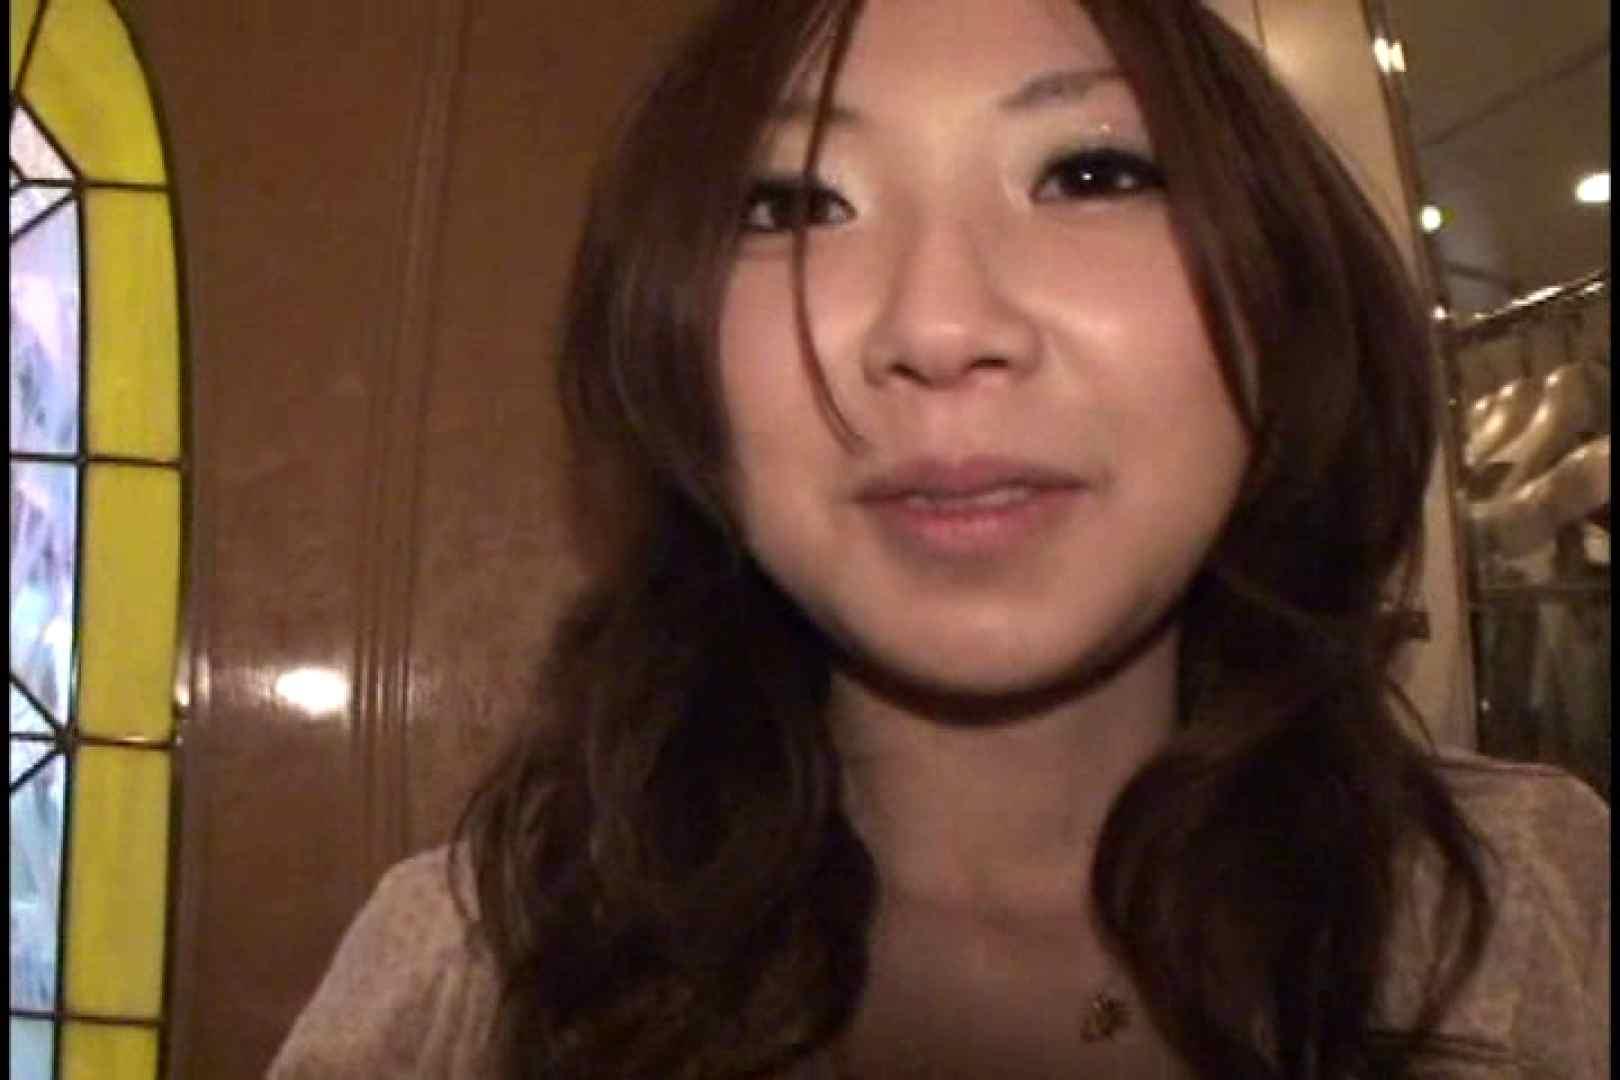 JDハンター全国ツアー vol.041 前編 女子大生のエロ動画   0  85PIX 35